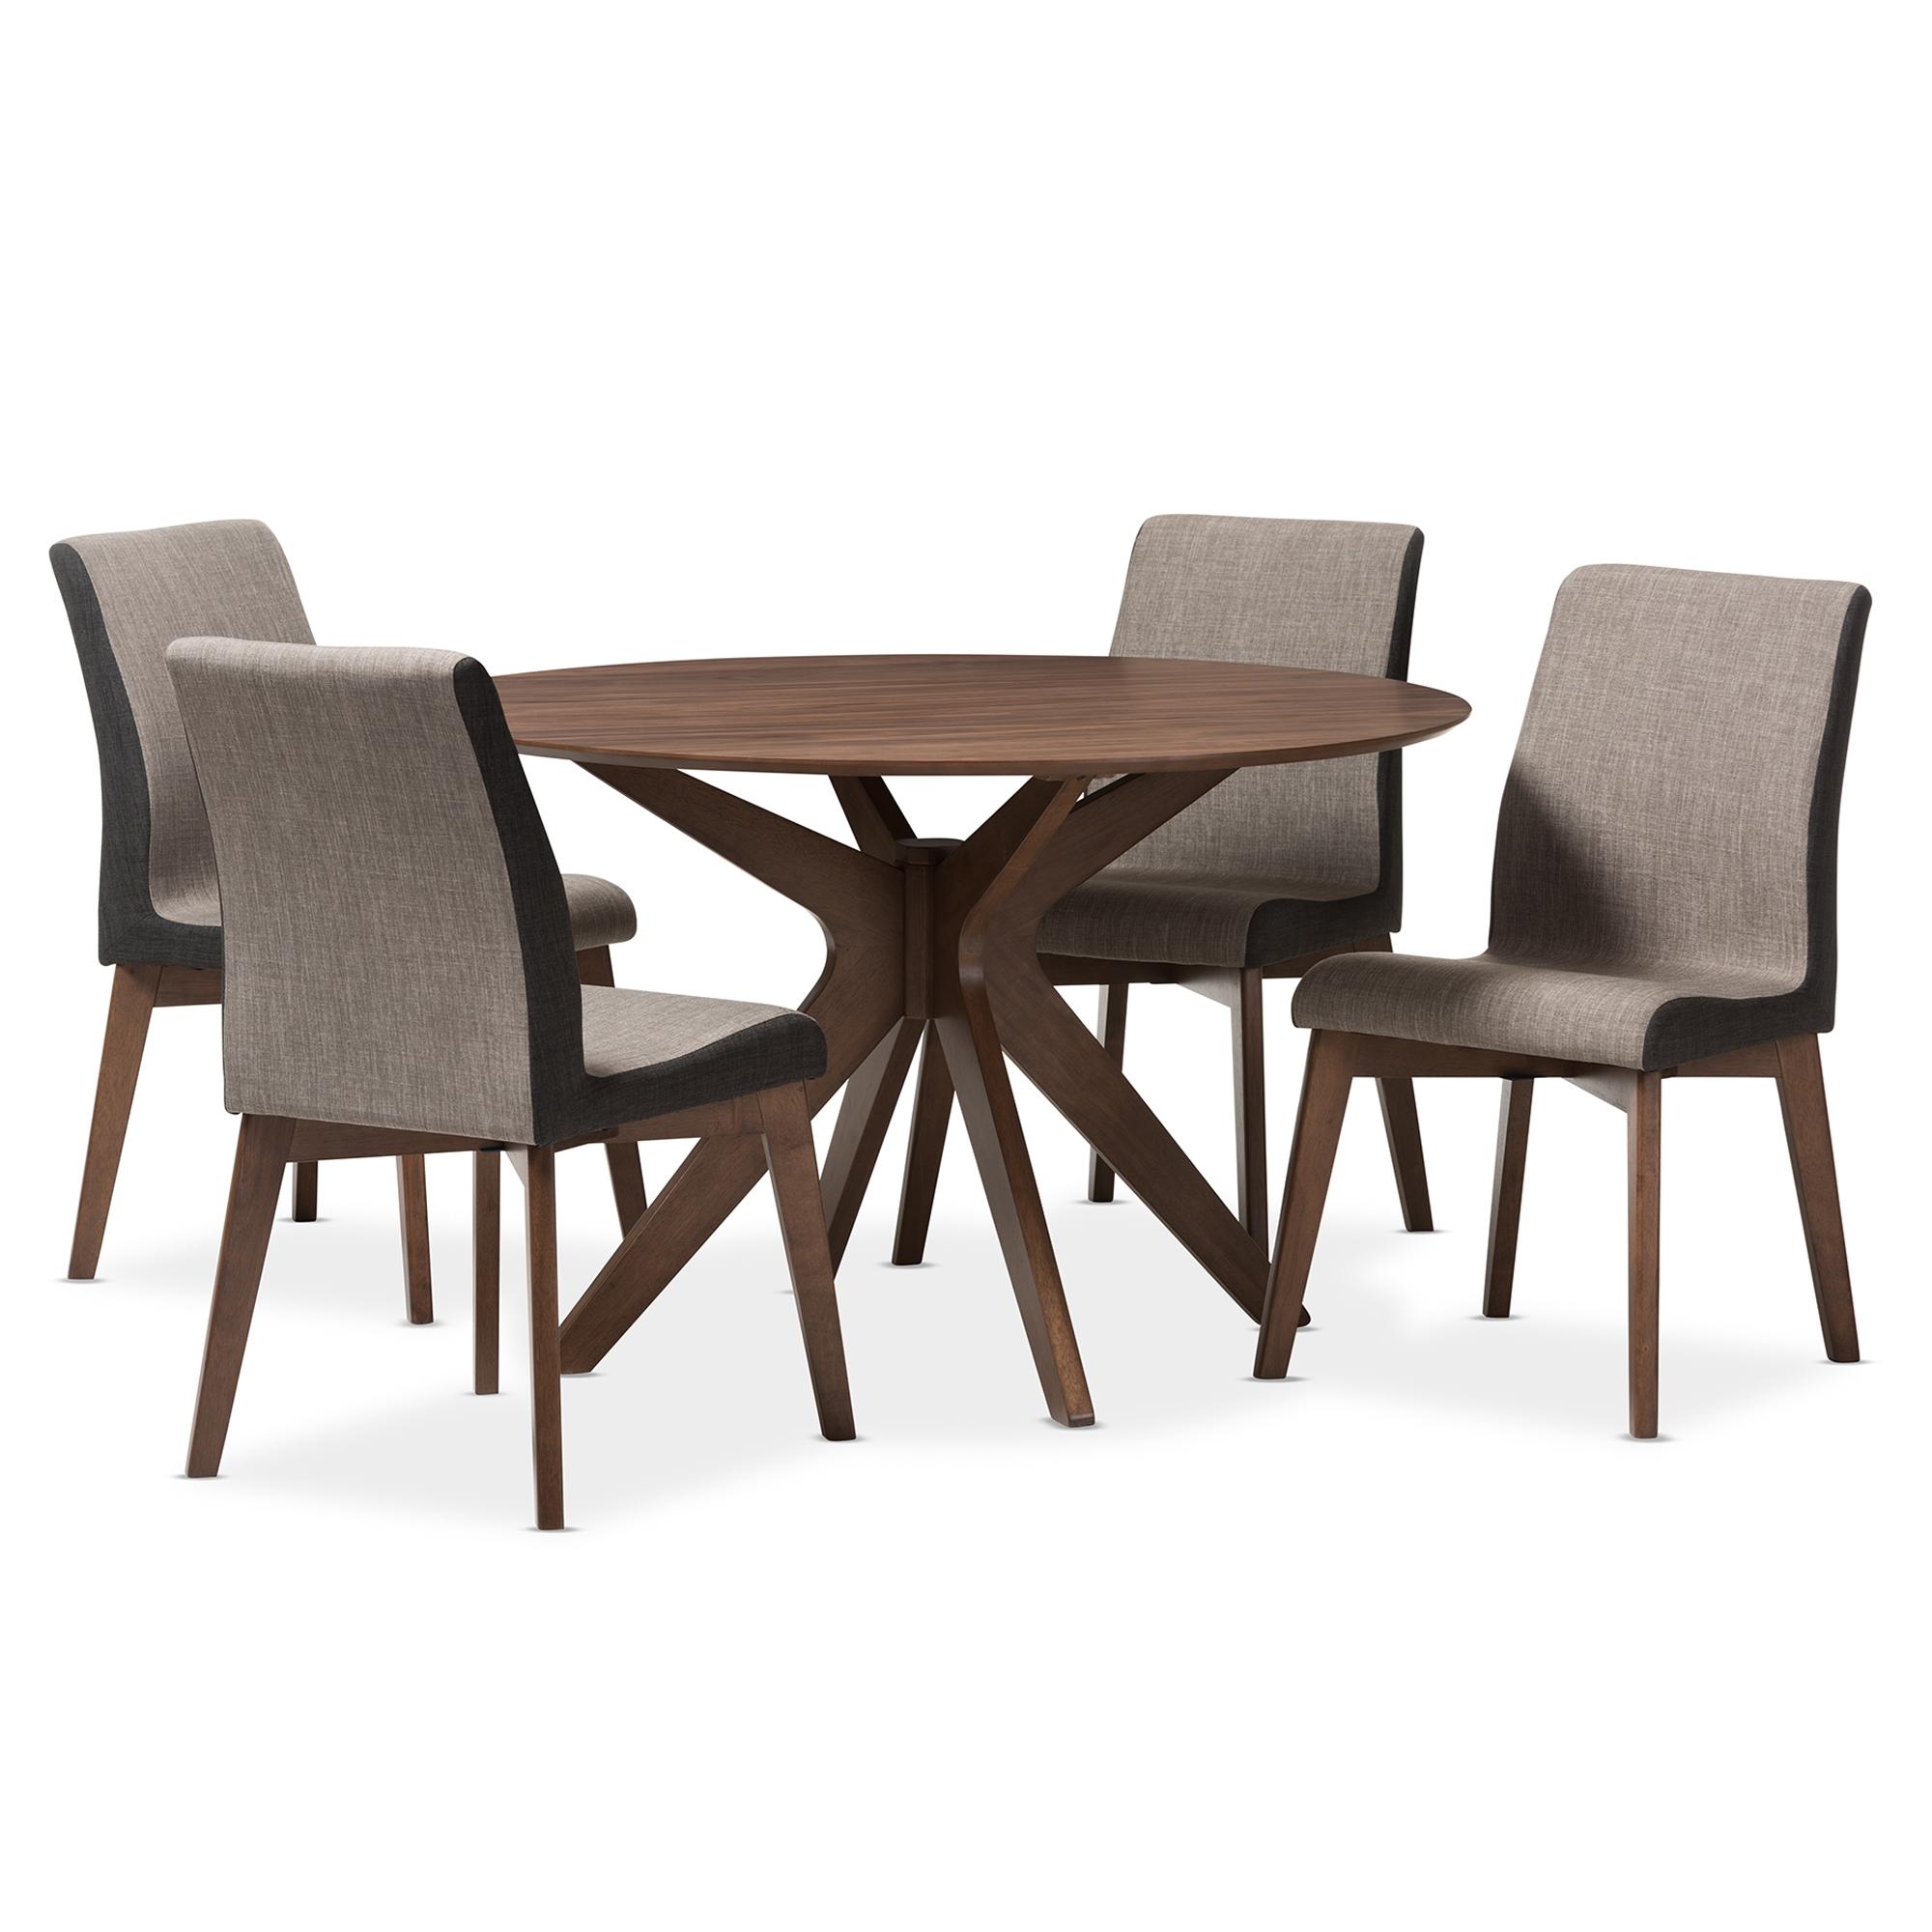 Baxton Studio Kimberly Mid Century Modern Walnut Wood Round 5 Piece Dining  Set